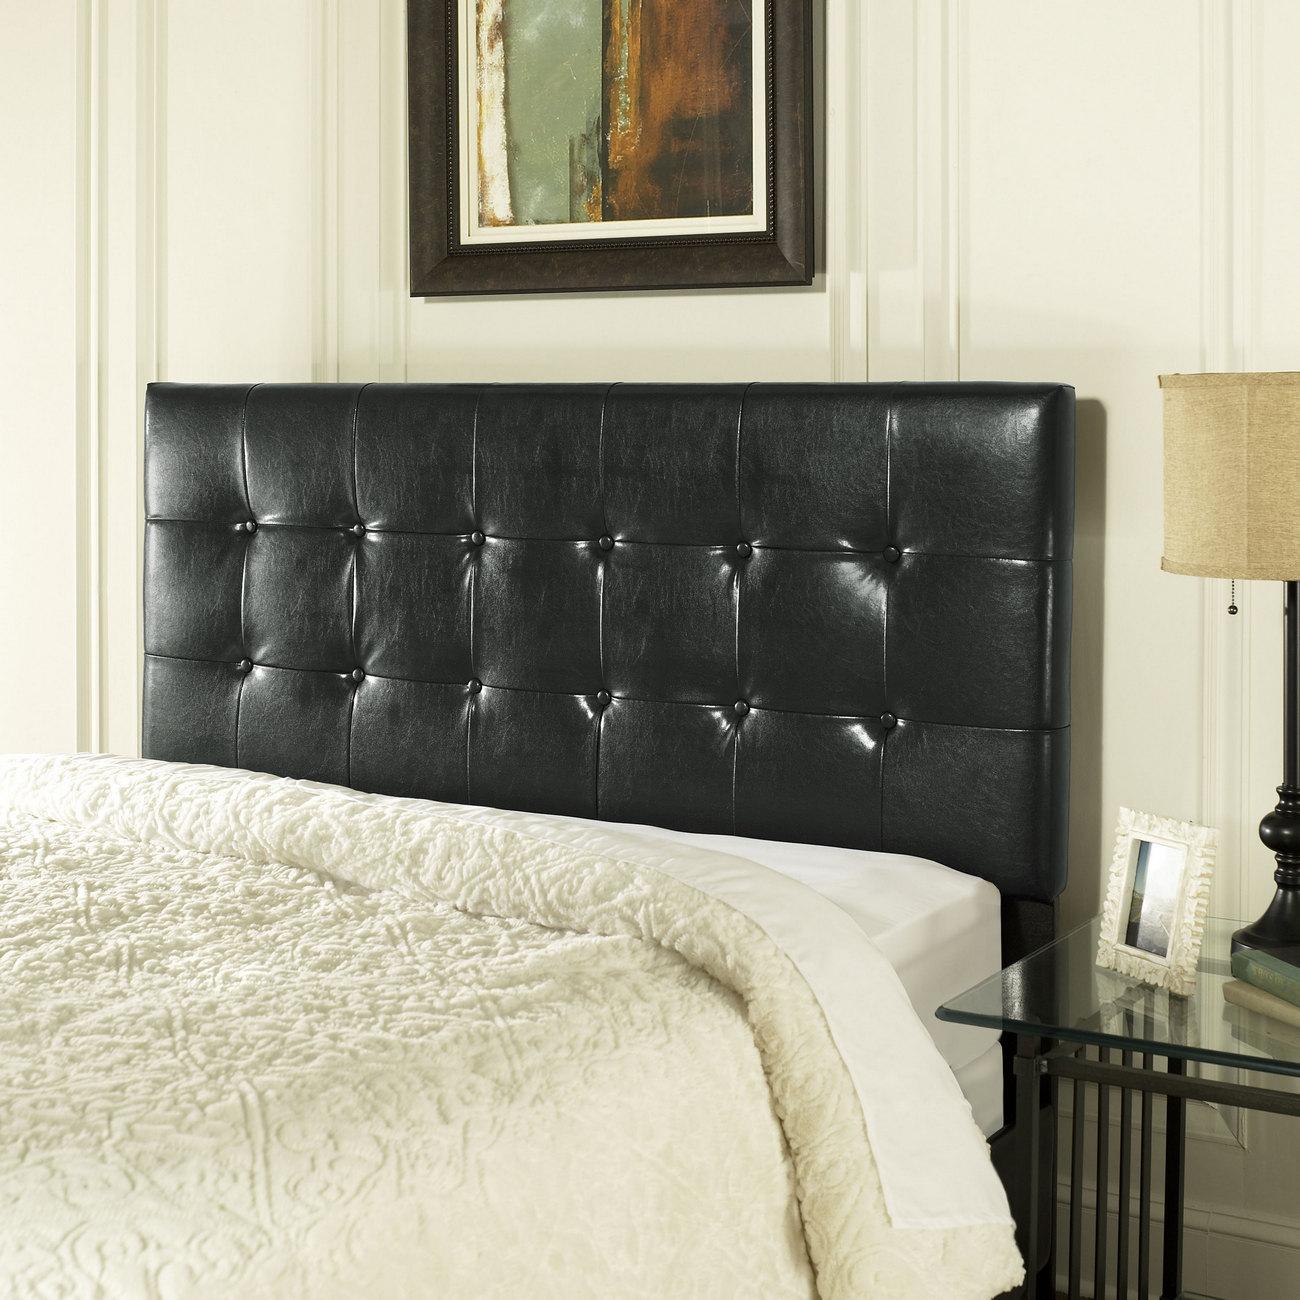 Andover King/Cal King Headboard in Black Leatherette - Crosley CF90001-601BK